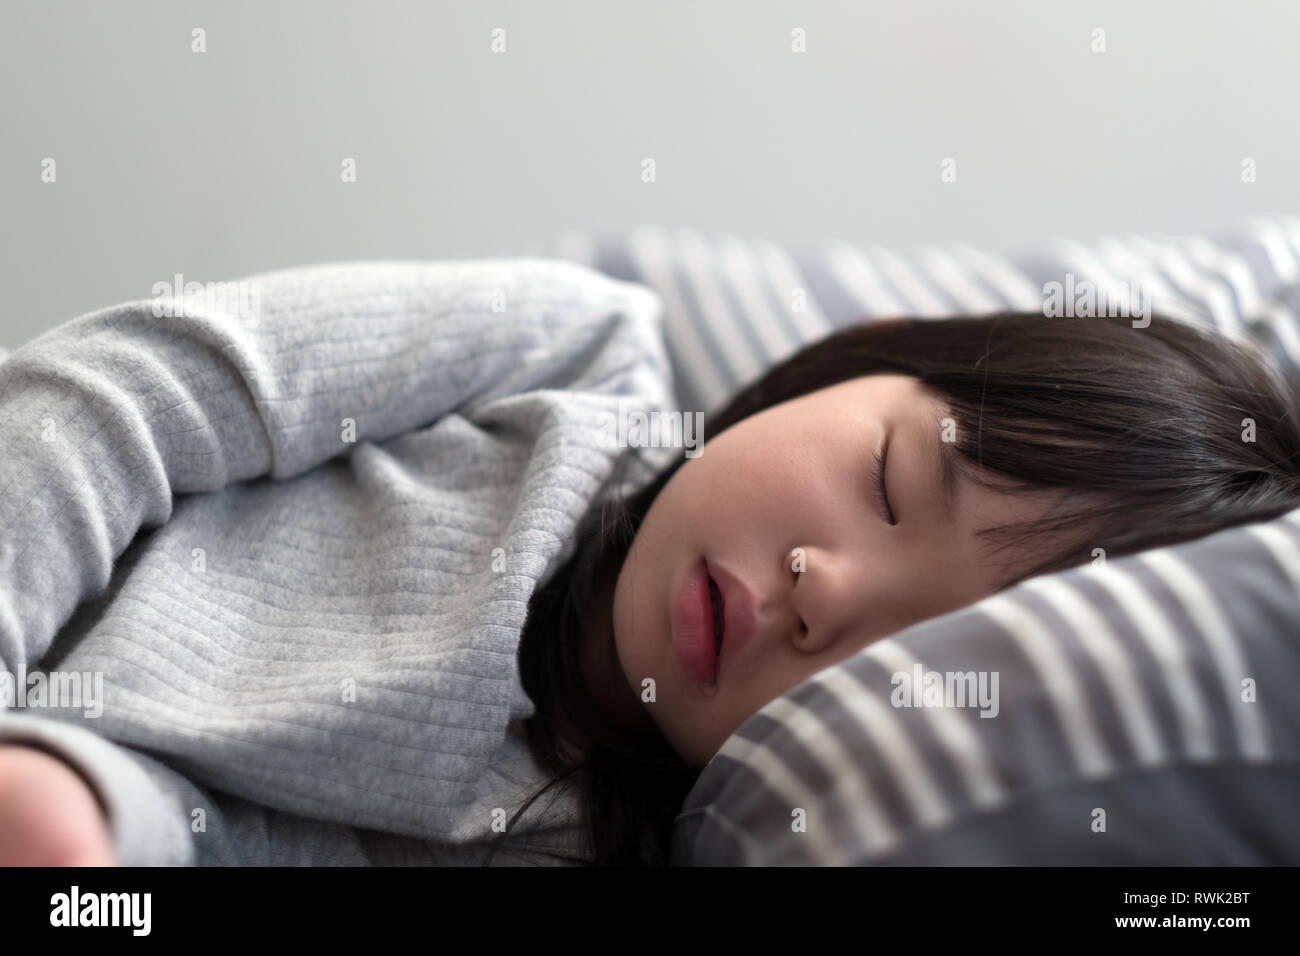 Child girl sleeping on bed - Stock Image